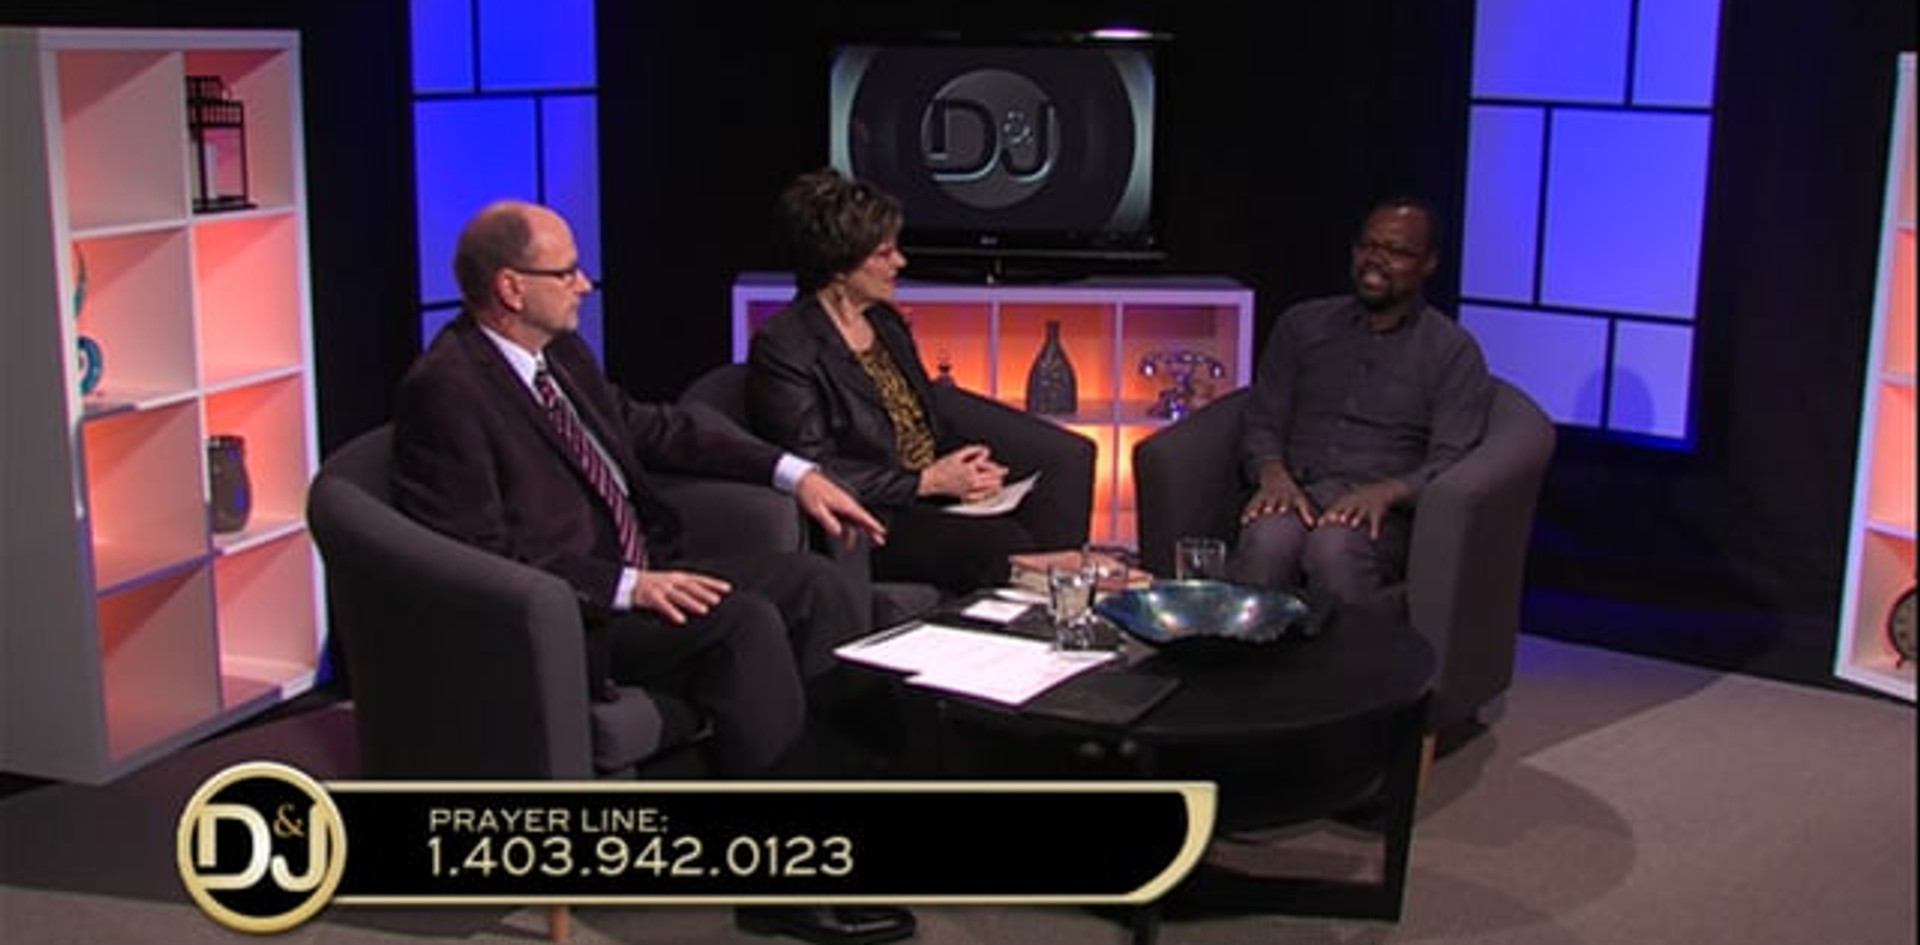 LIFELINE TODAY | Seaon 2, Episode 46 | Daniel Zopoula